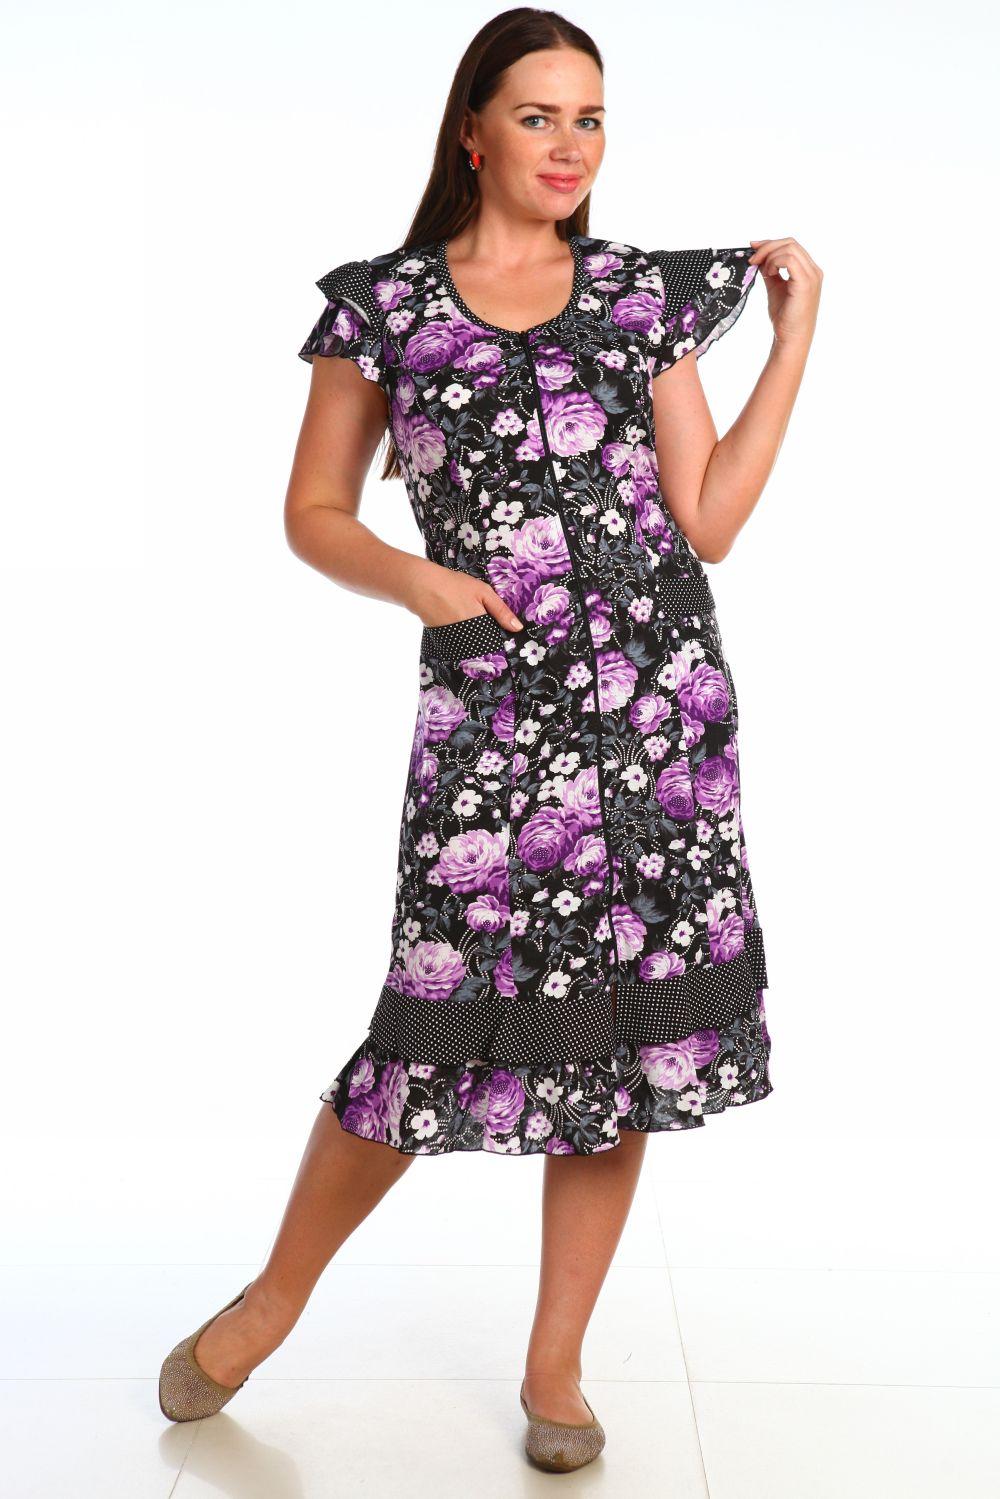 Халат женский Стрекоза без рукаваДомашняя одежда<br><br><br>Размер: 64